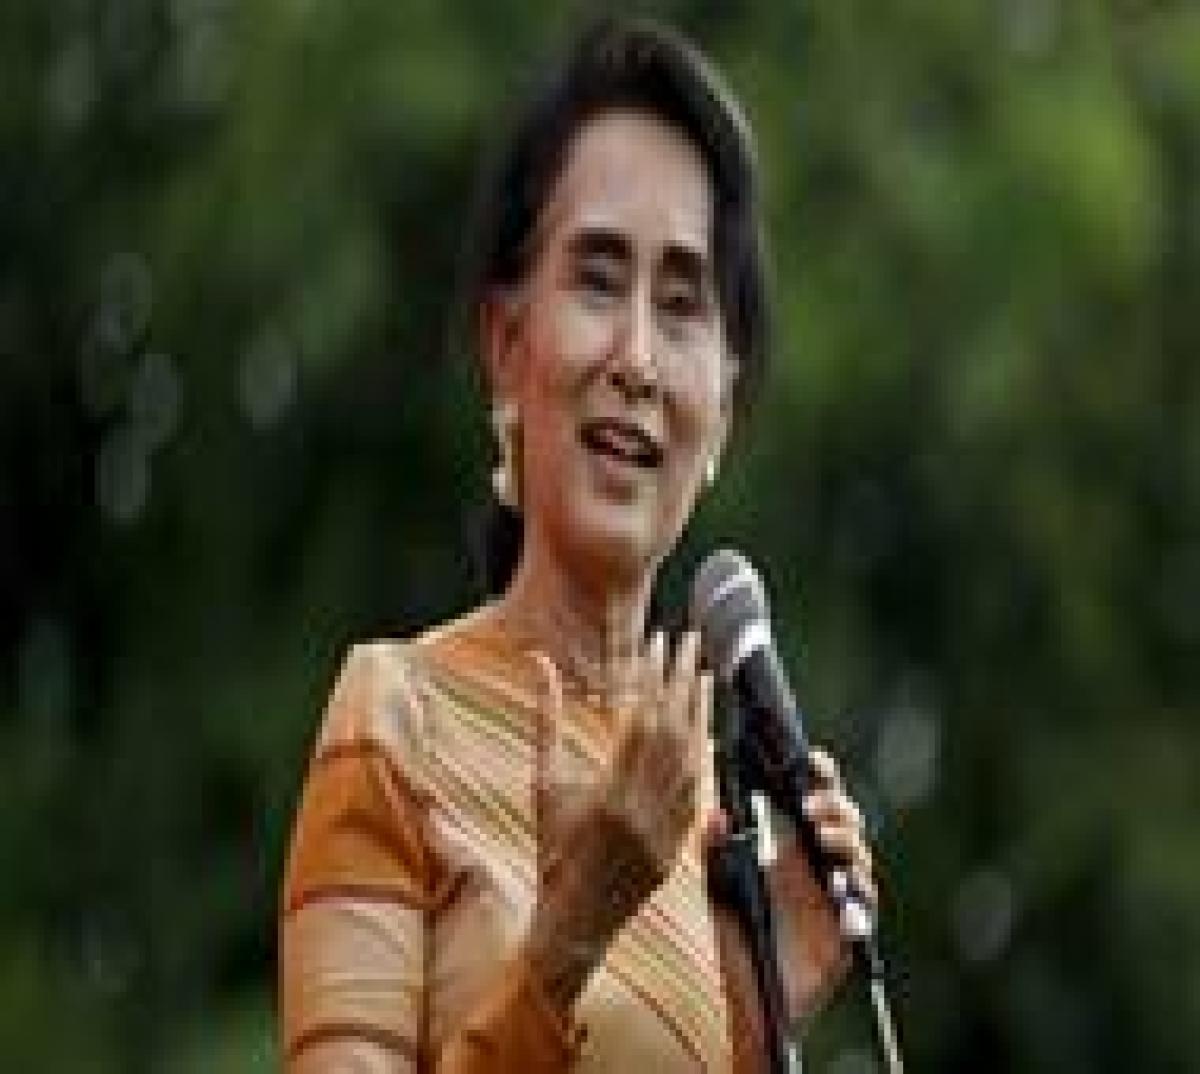 Media, civil society should boost India-Myanmar ties: Experts